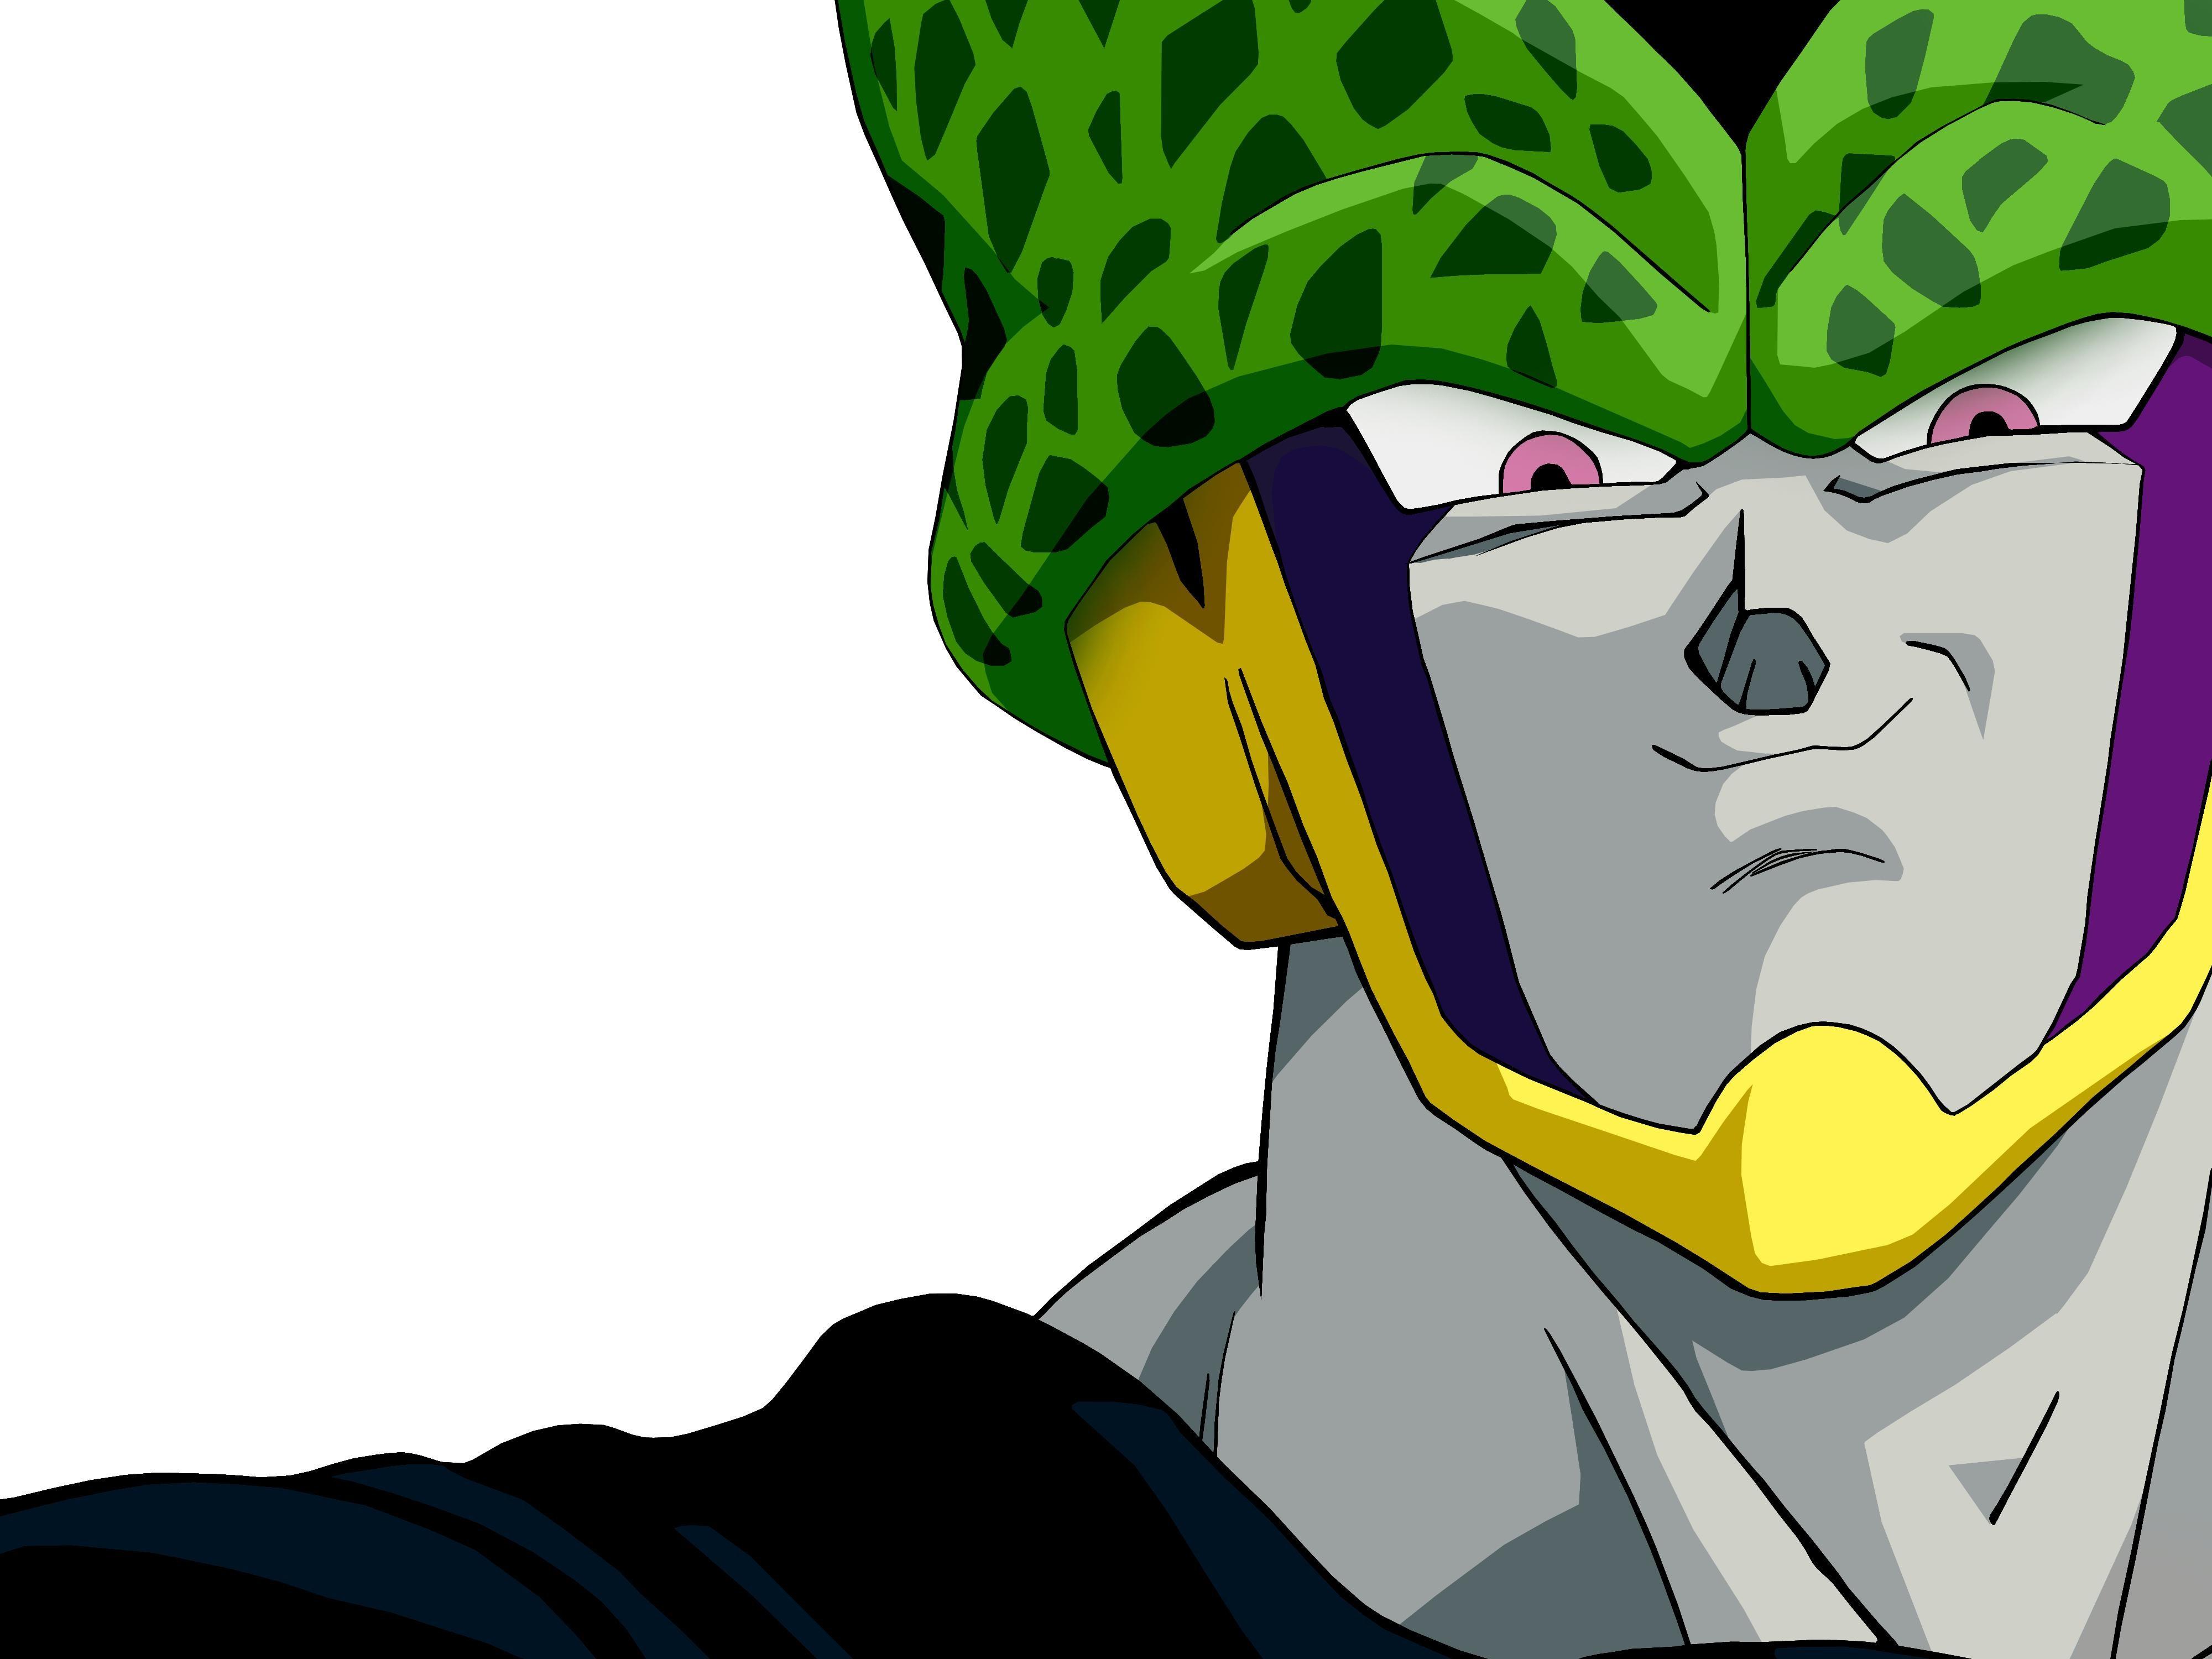 Wallpaper Illustration Anime Joker Cartoon Dragon Ball Dragon Ball Z Comics Cell Character Fictional Character Comic Book Supervillain 4000x3000 Legato 222164 Hd Wallpapers Wallhere